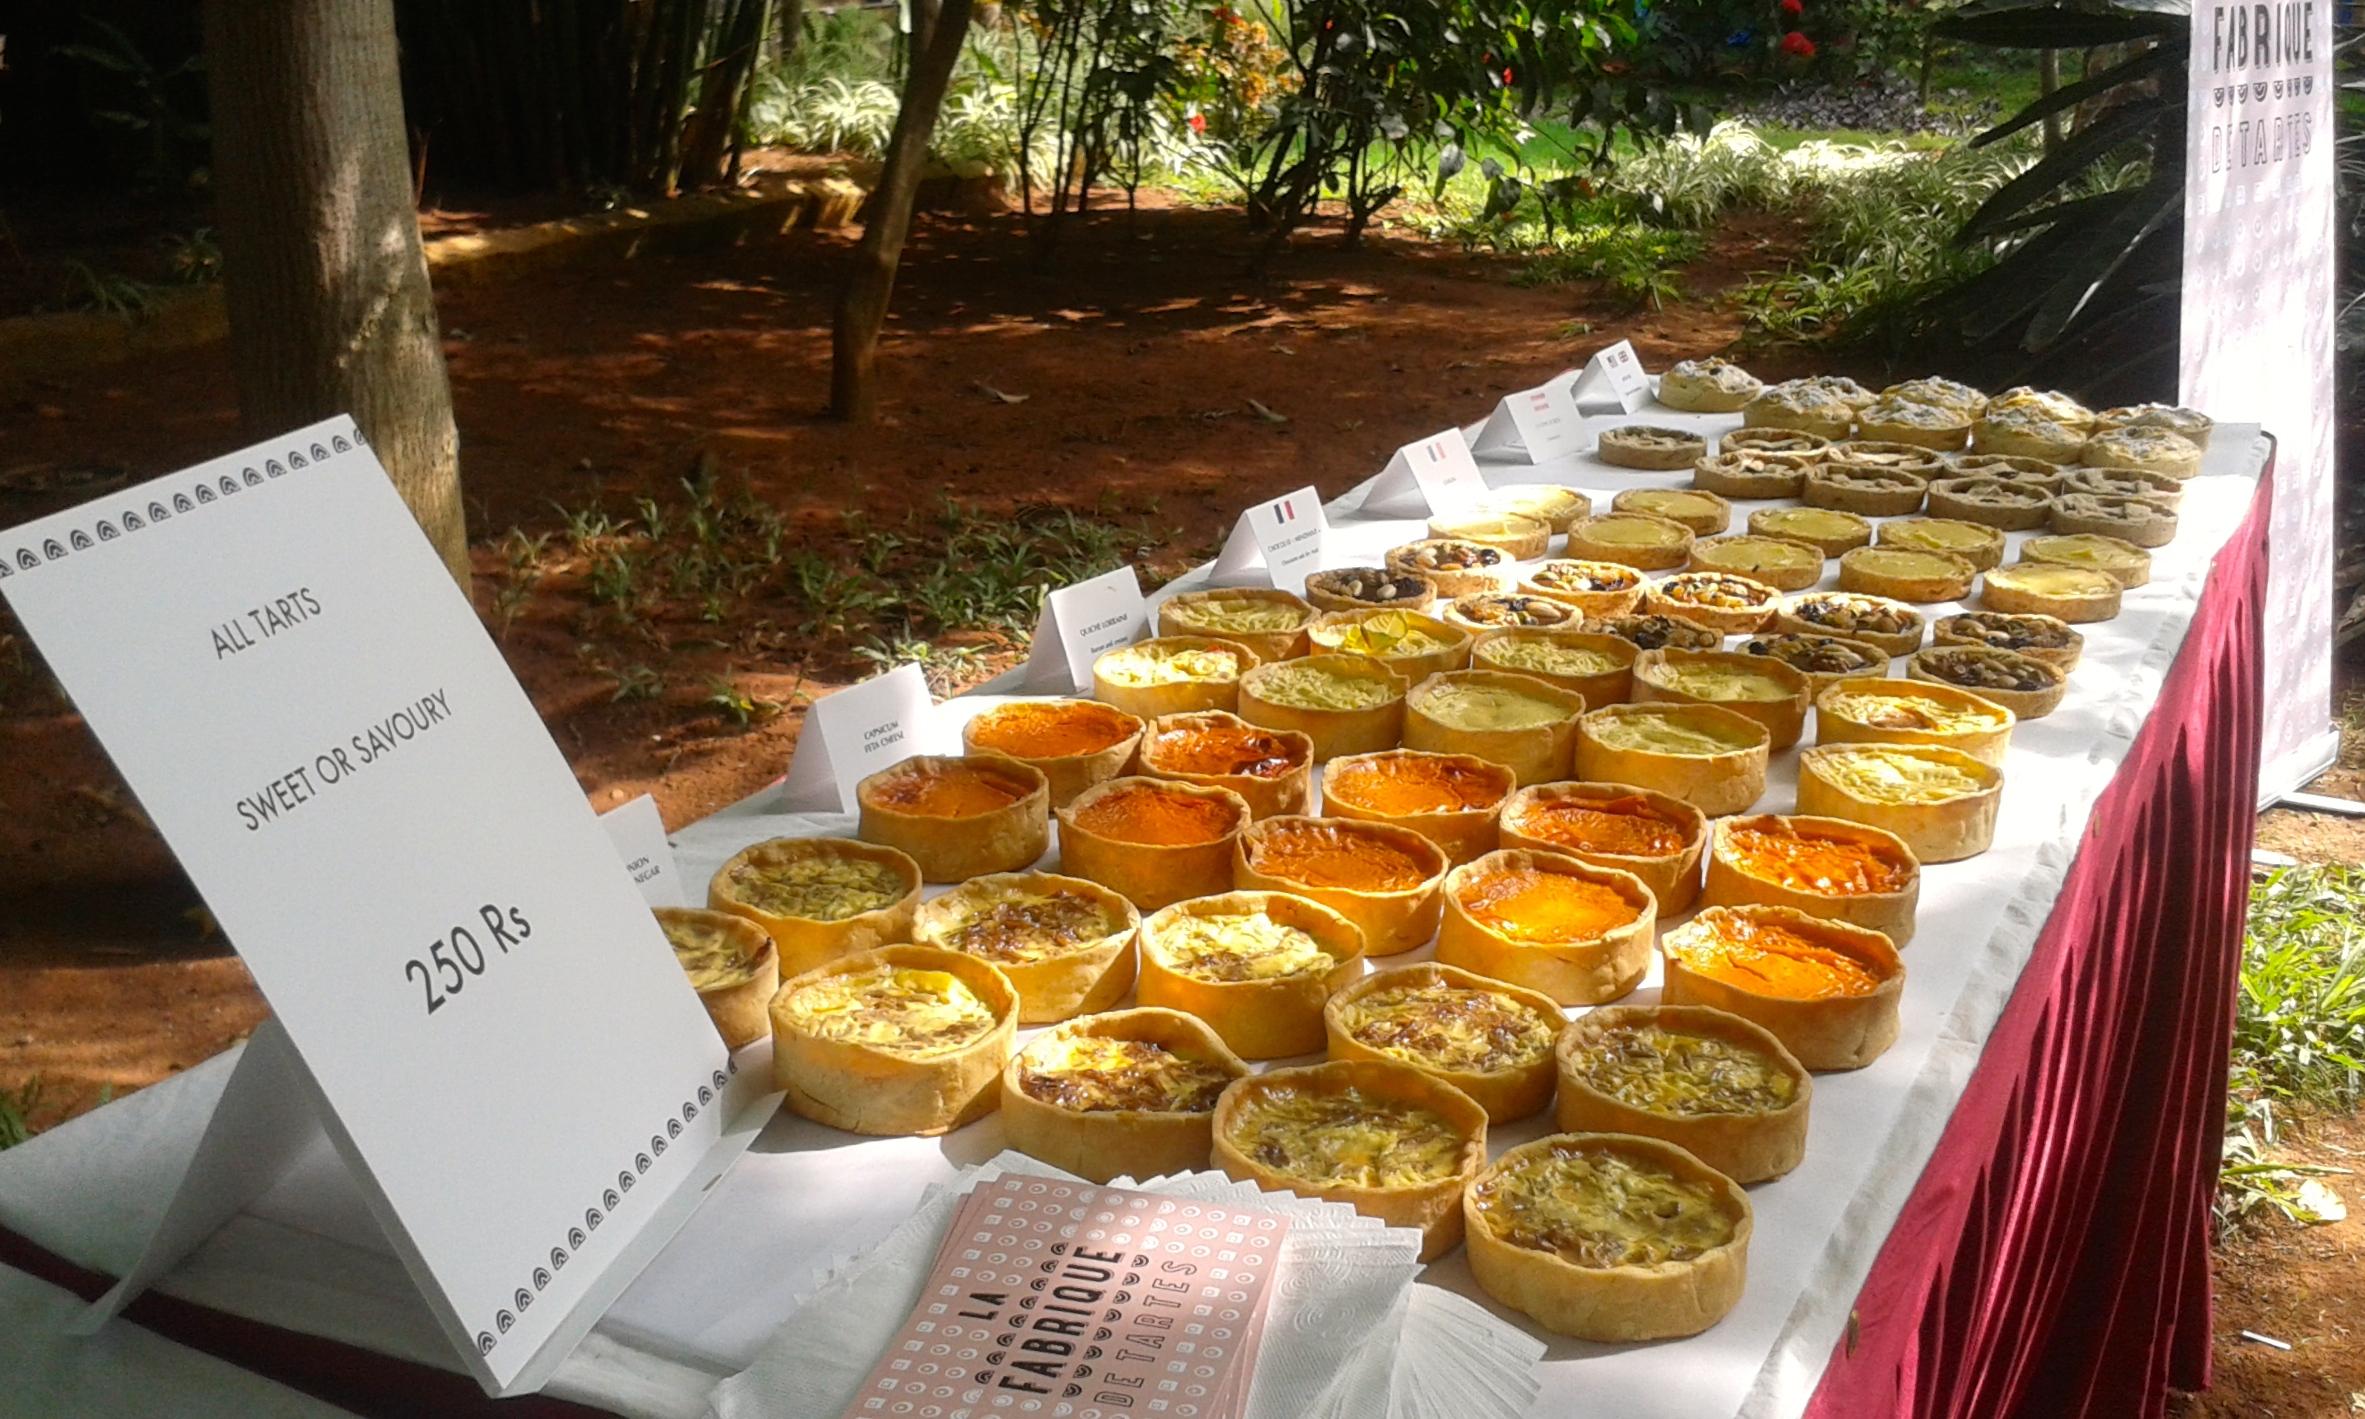 Dec 2014: artisan markets. Over 200 tarts sold.